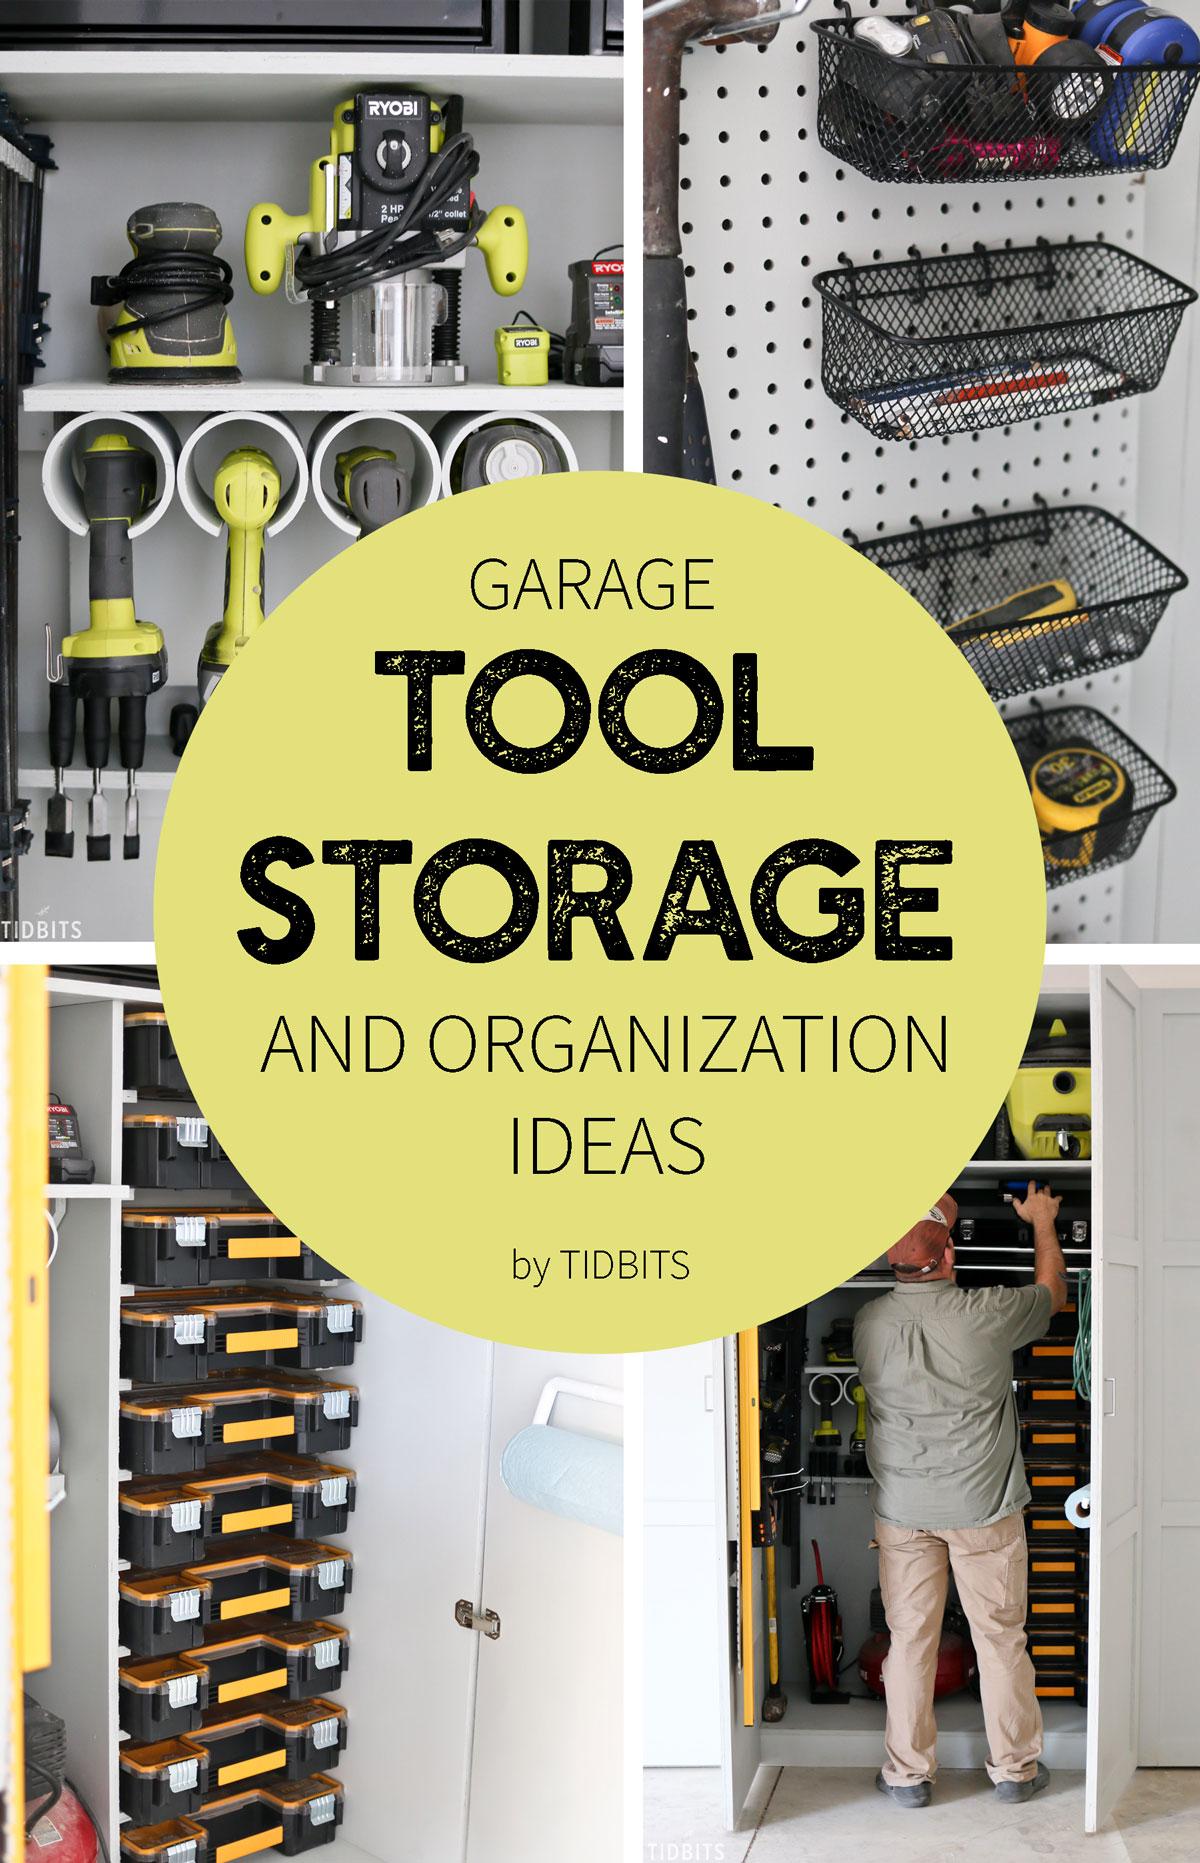 Garage Tool Storage And Organization Ideas Tidbits